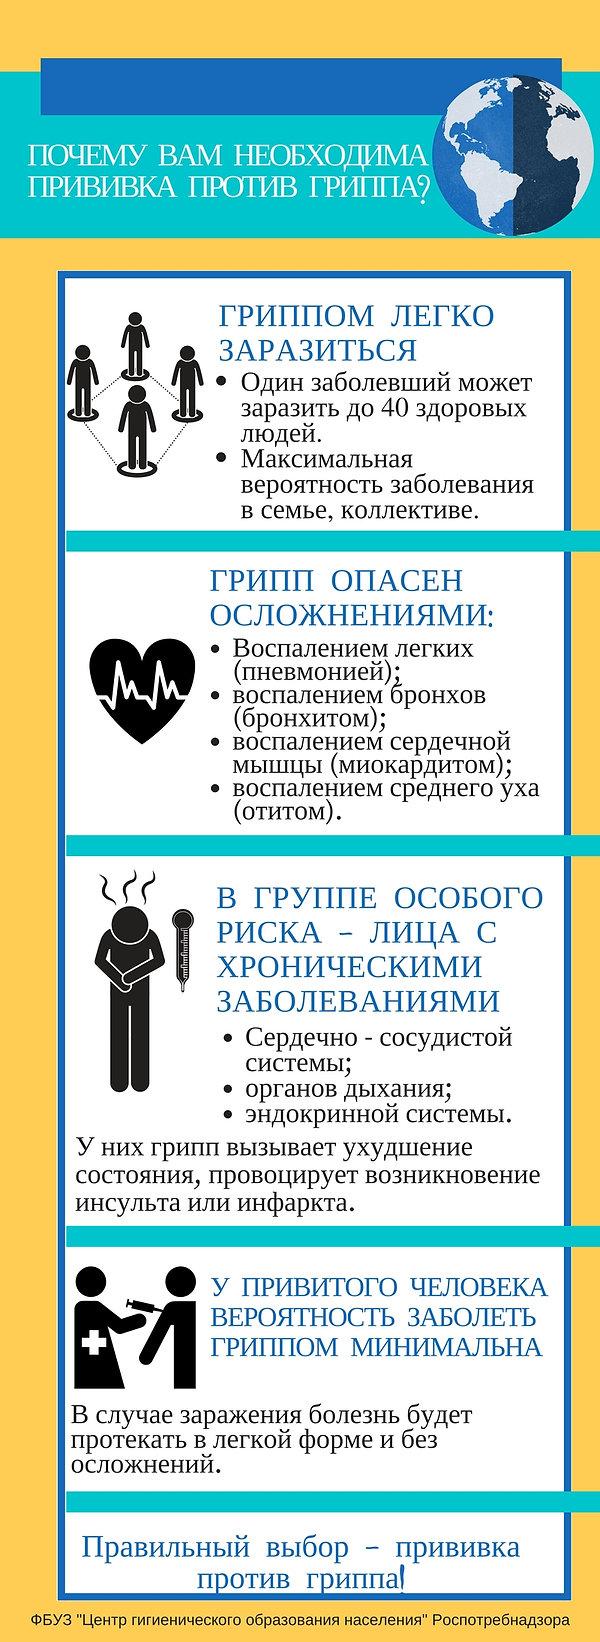 ПОЧЕМУ НУЖНА ПРИВИВКА ГРИПП.jpg